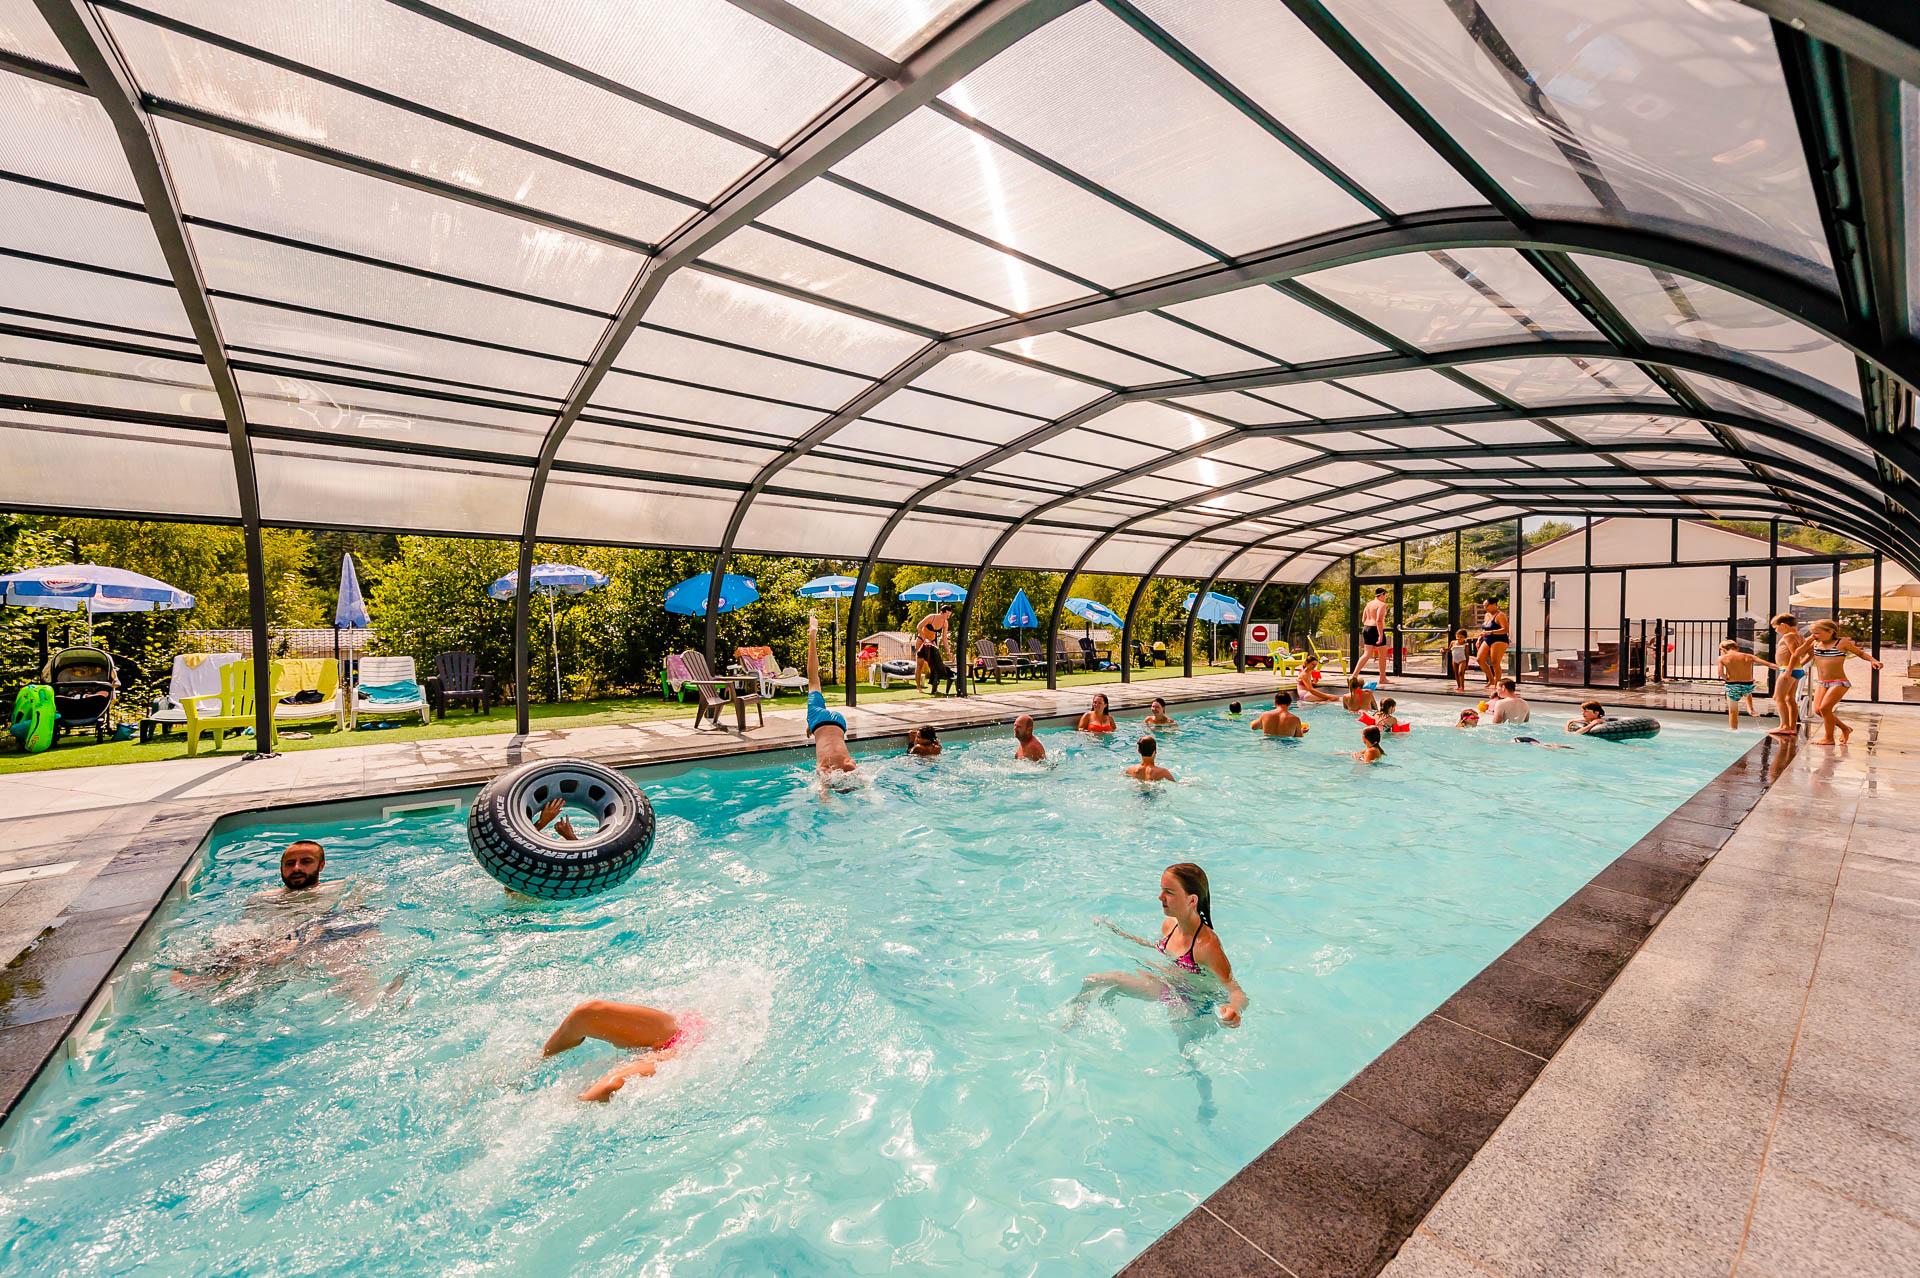 Camping & pool